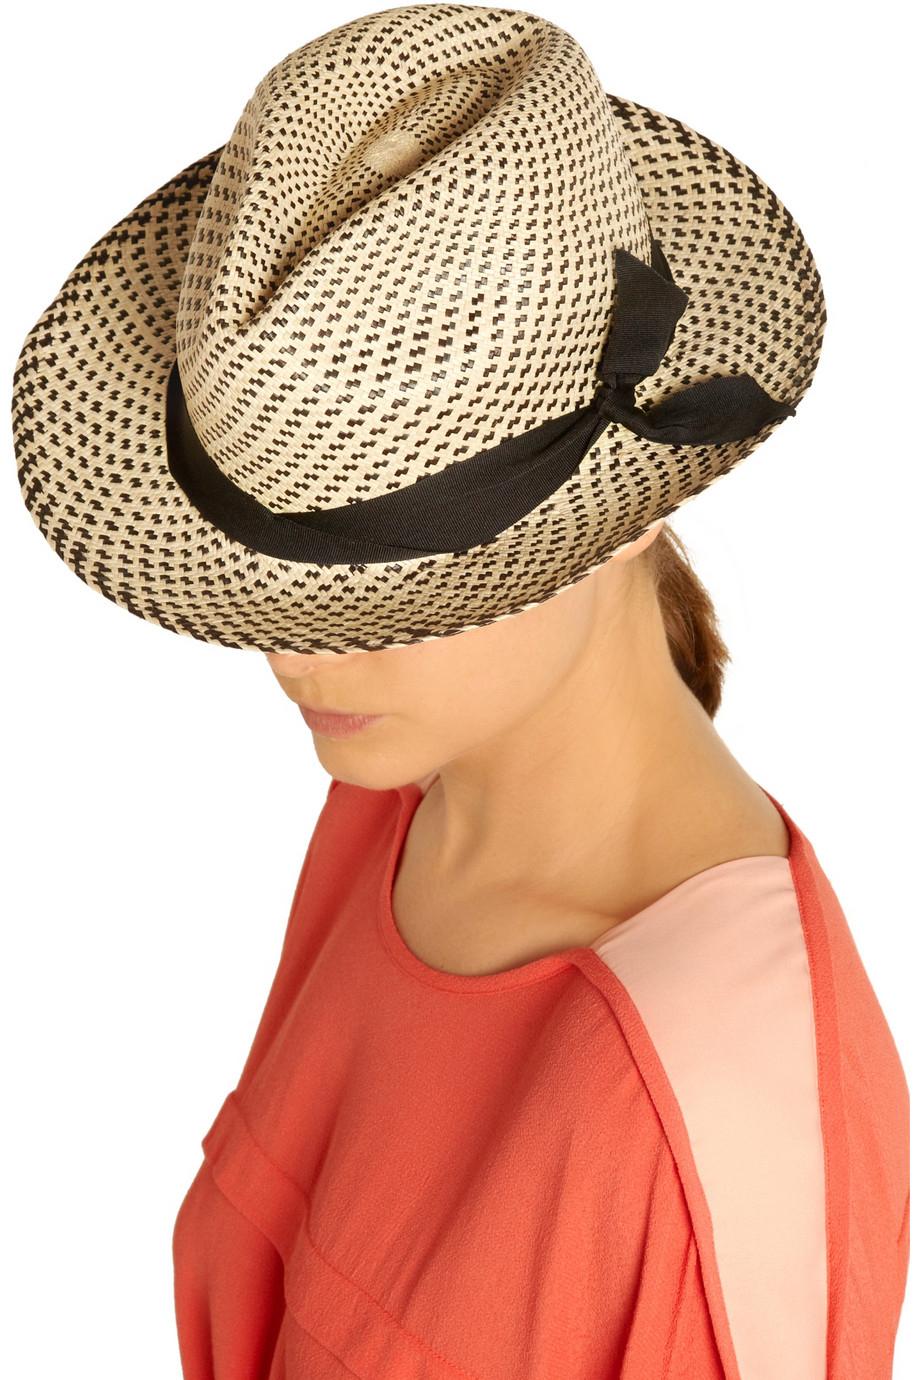 5e5d7901 Sensi Studio New Erosion Toquilla Straw Panama Hat in Natural - Lyst